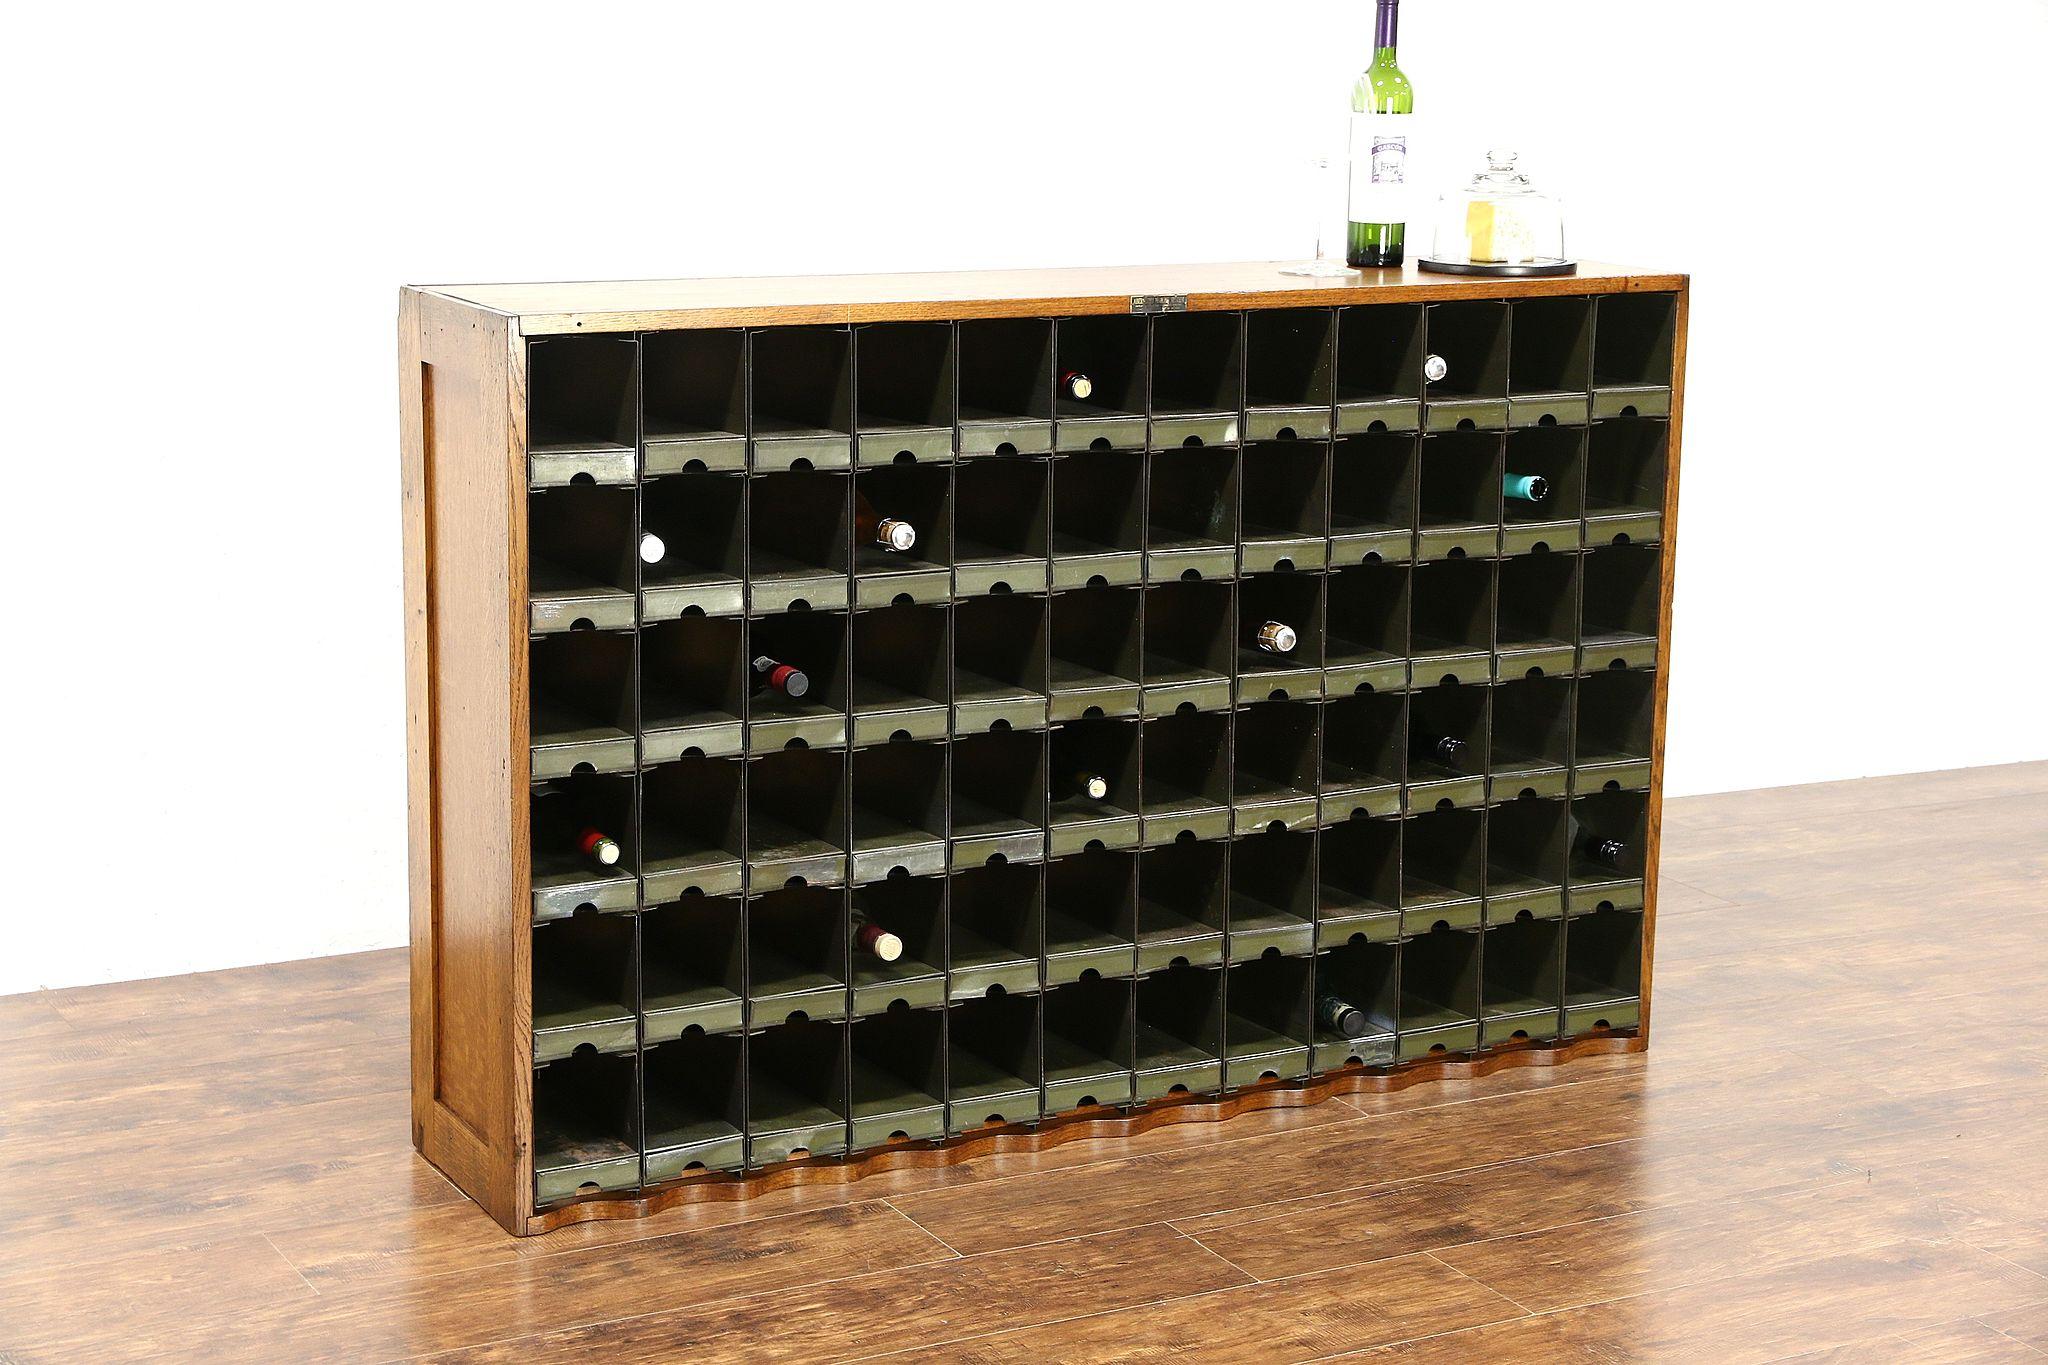 wine under vurm and cabinets adams jk cabinet glassware ikea rack bottle